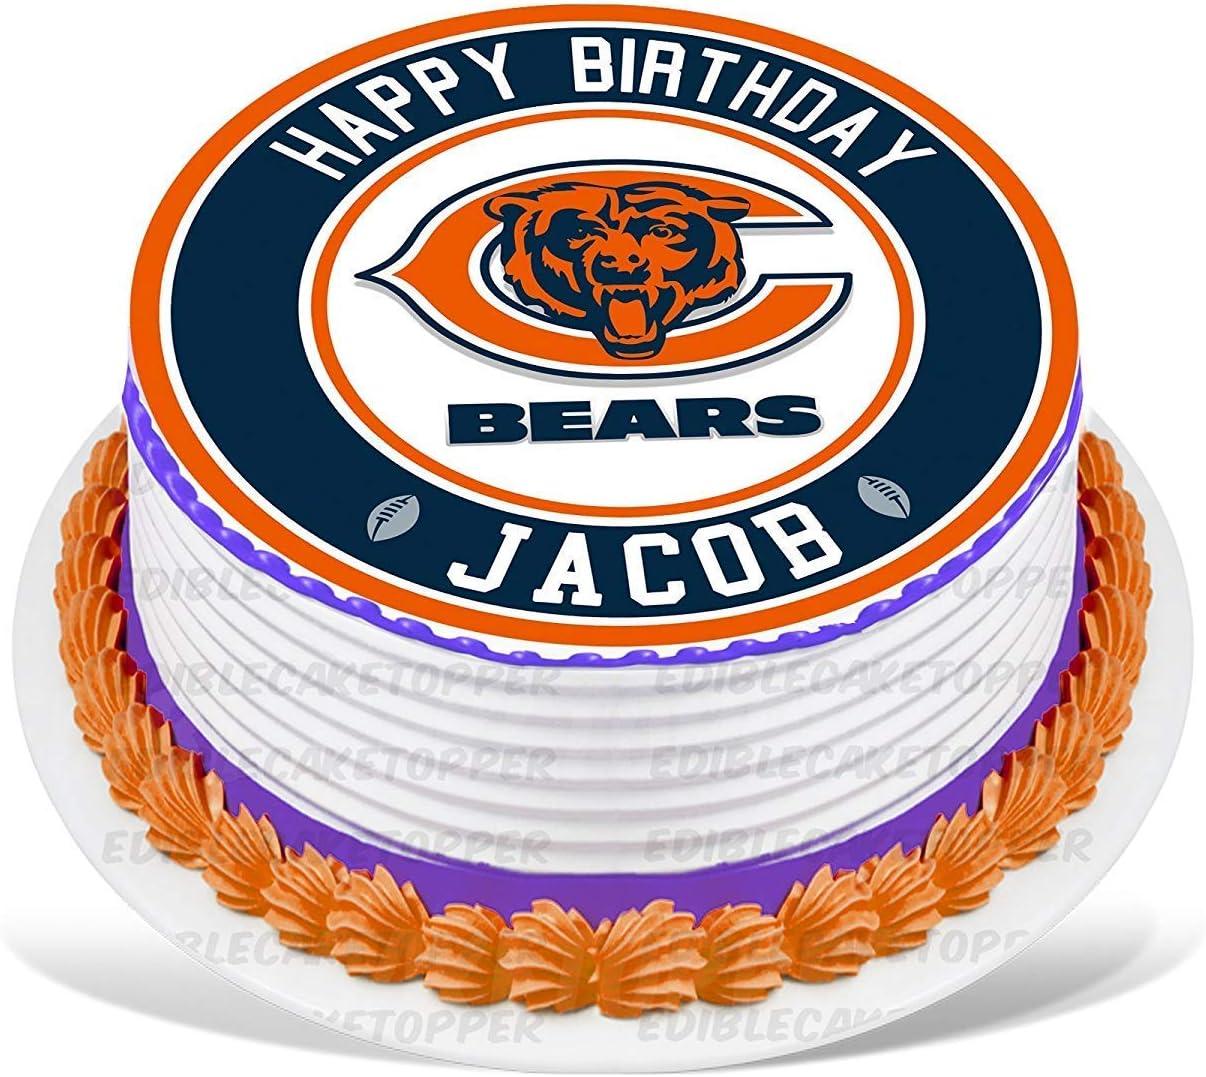 Peachy Amazon Com Partyprint Chicago Bears Edible Cake Topper Funny Birthday Cards Online Fluifree Goldxyz